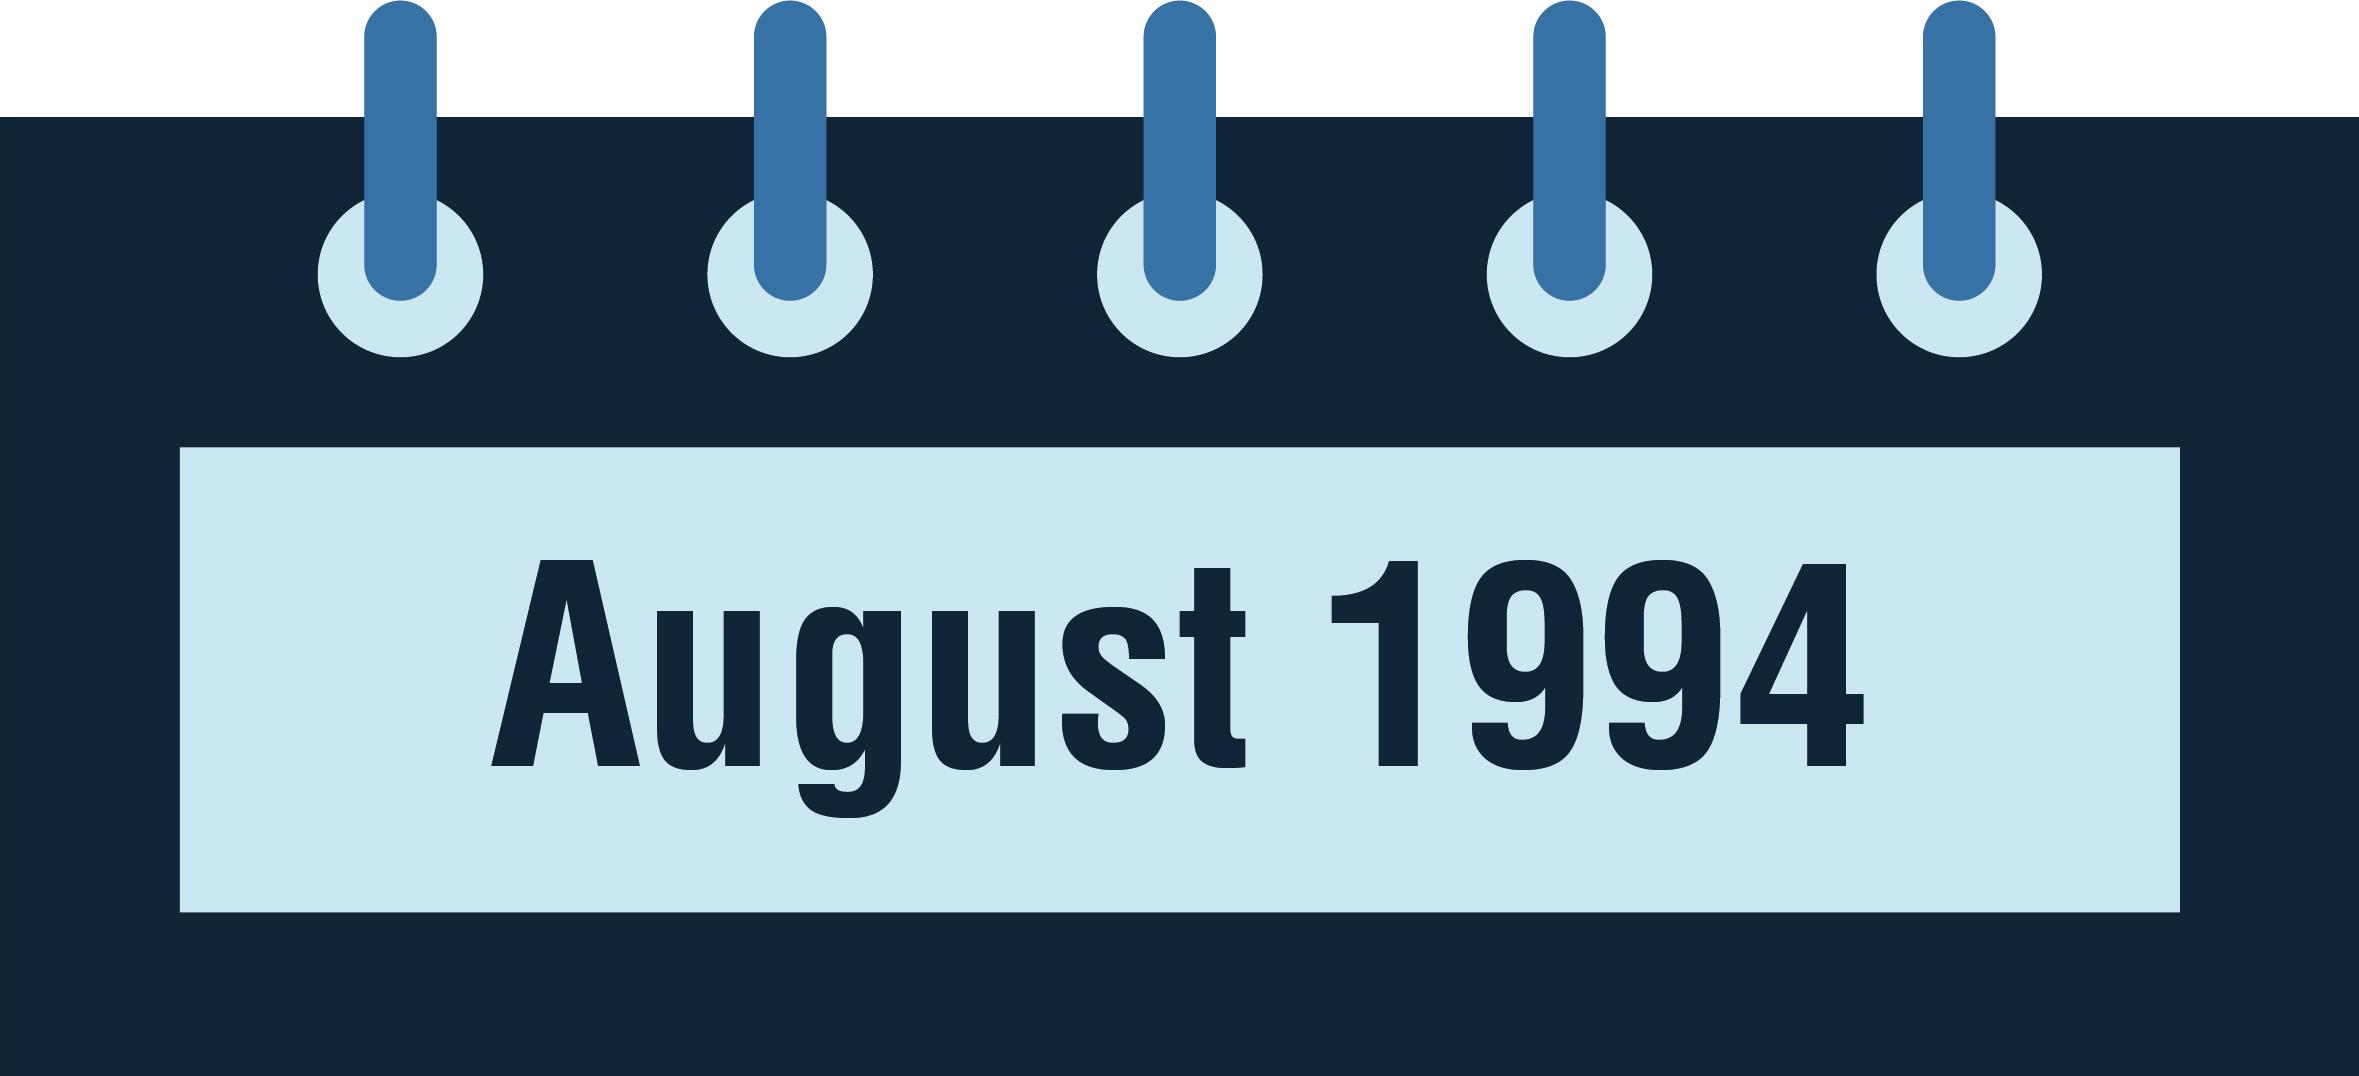 NeuroCheck History - August 1994 (Image © NeuroCheck)